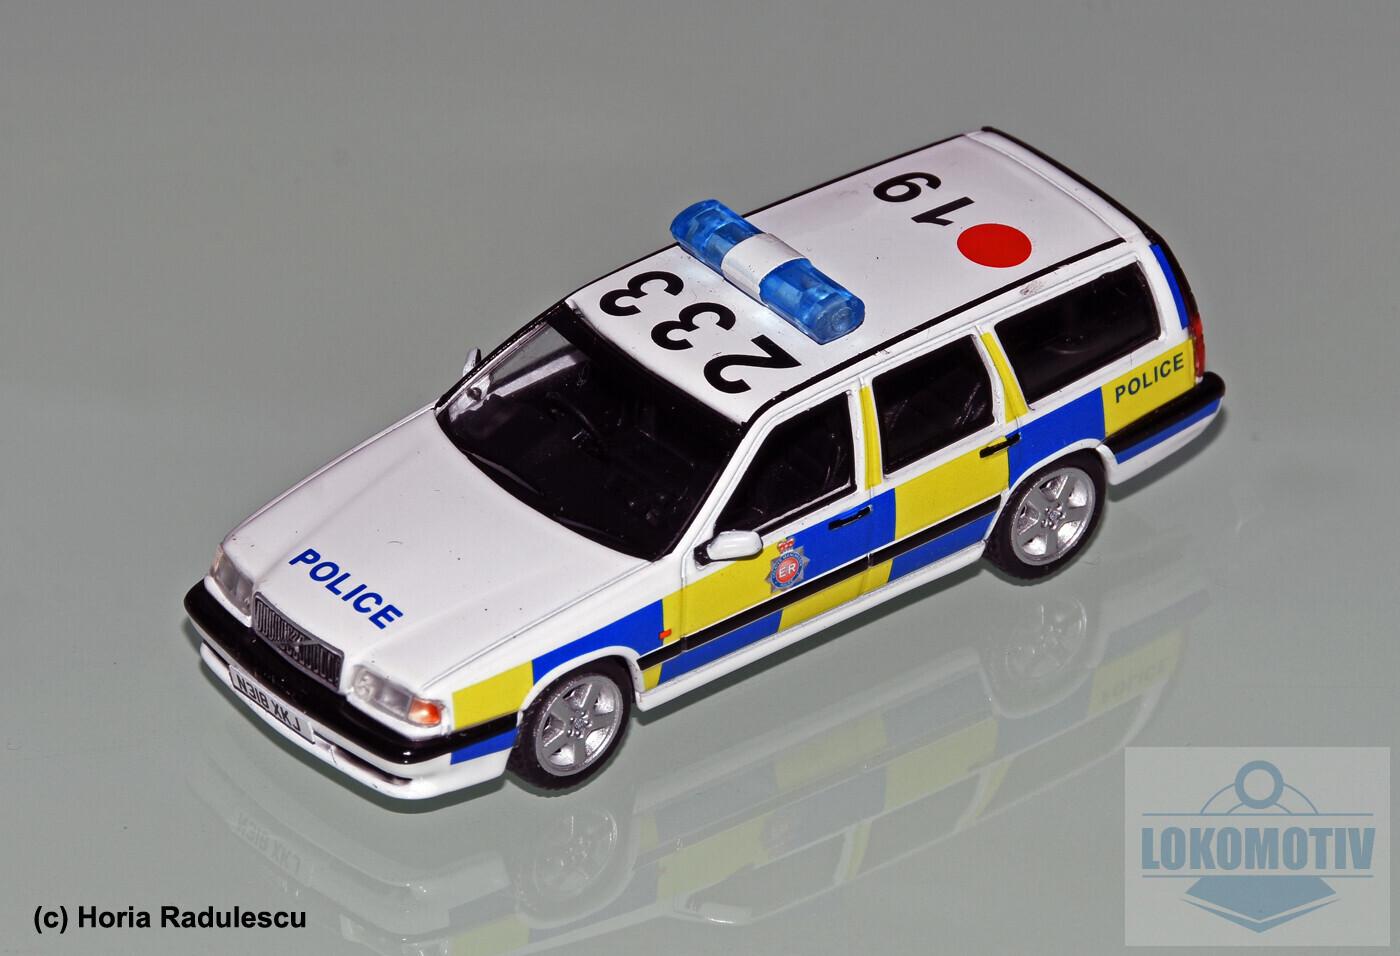 64-GB-Battenberg-Police-Volvo-850-Tarmac-Works-1e55f06874596b6be.jpg